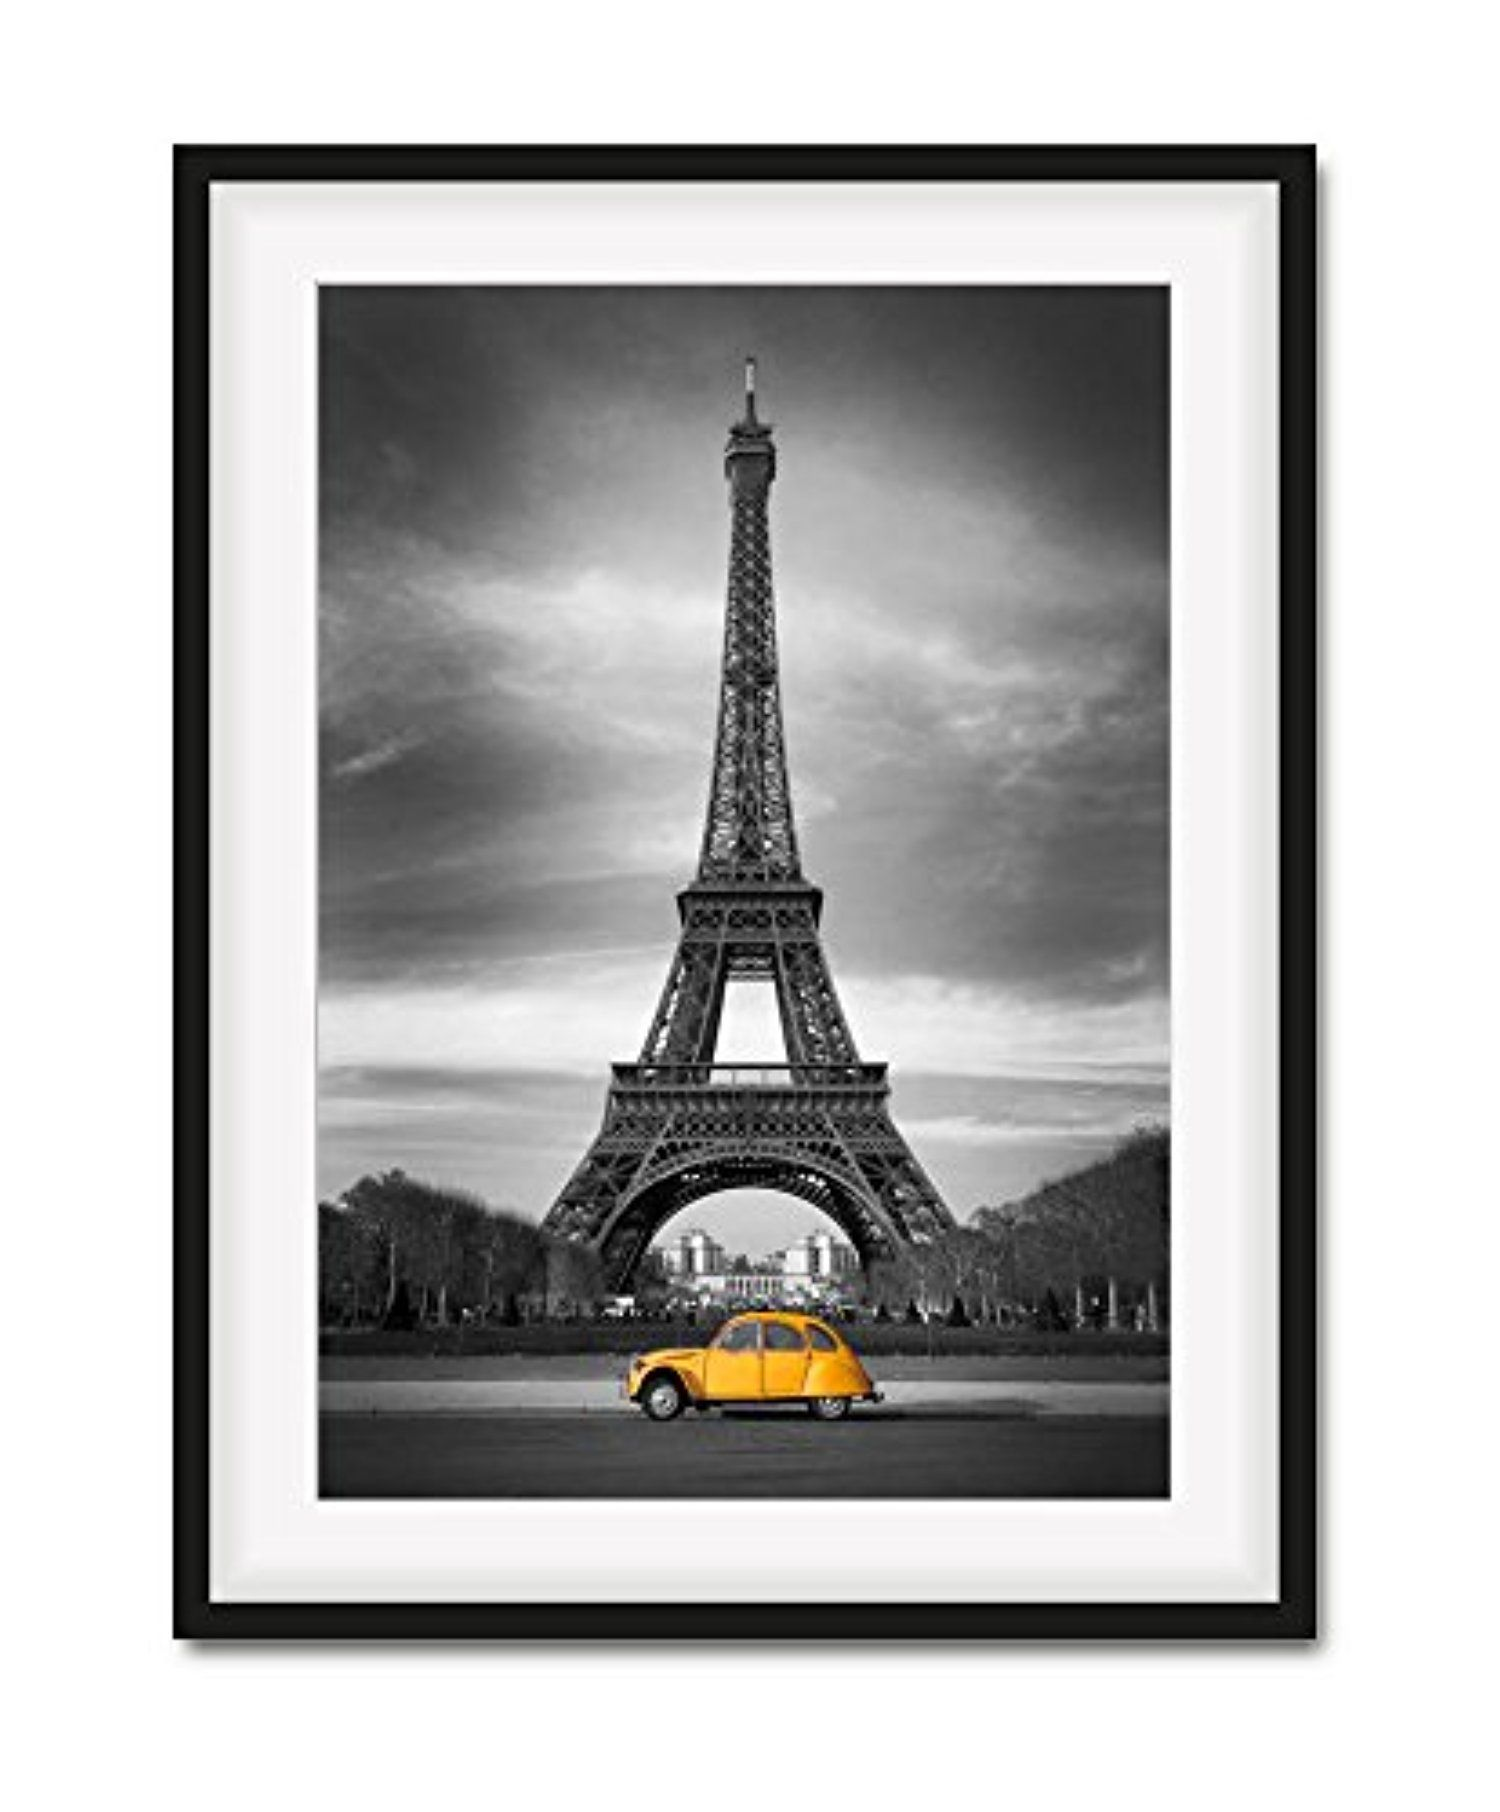 Paris Street Eiffel tower Photo  Print On Framed Canvas Wall Art Home Decoration